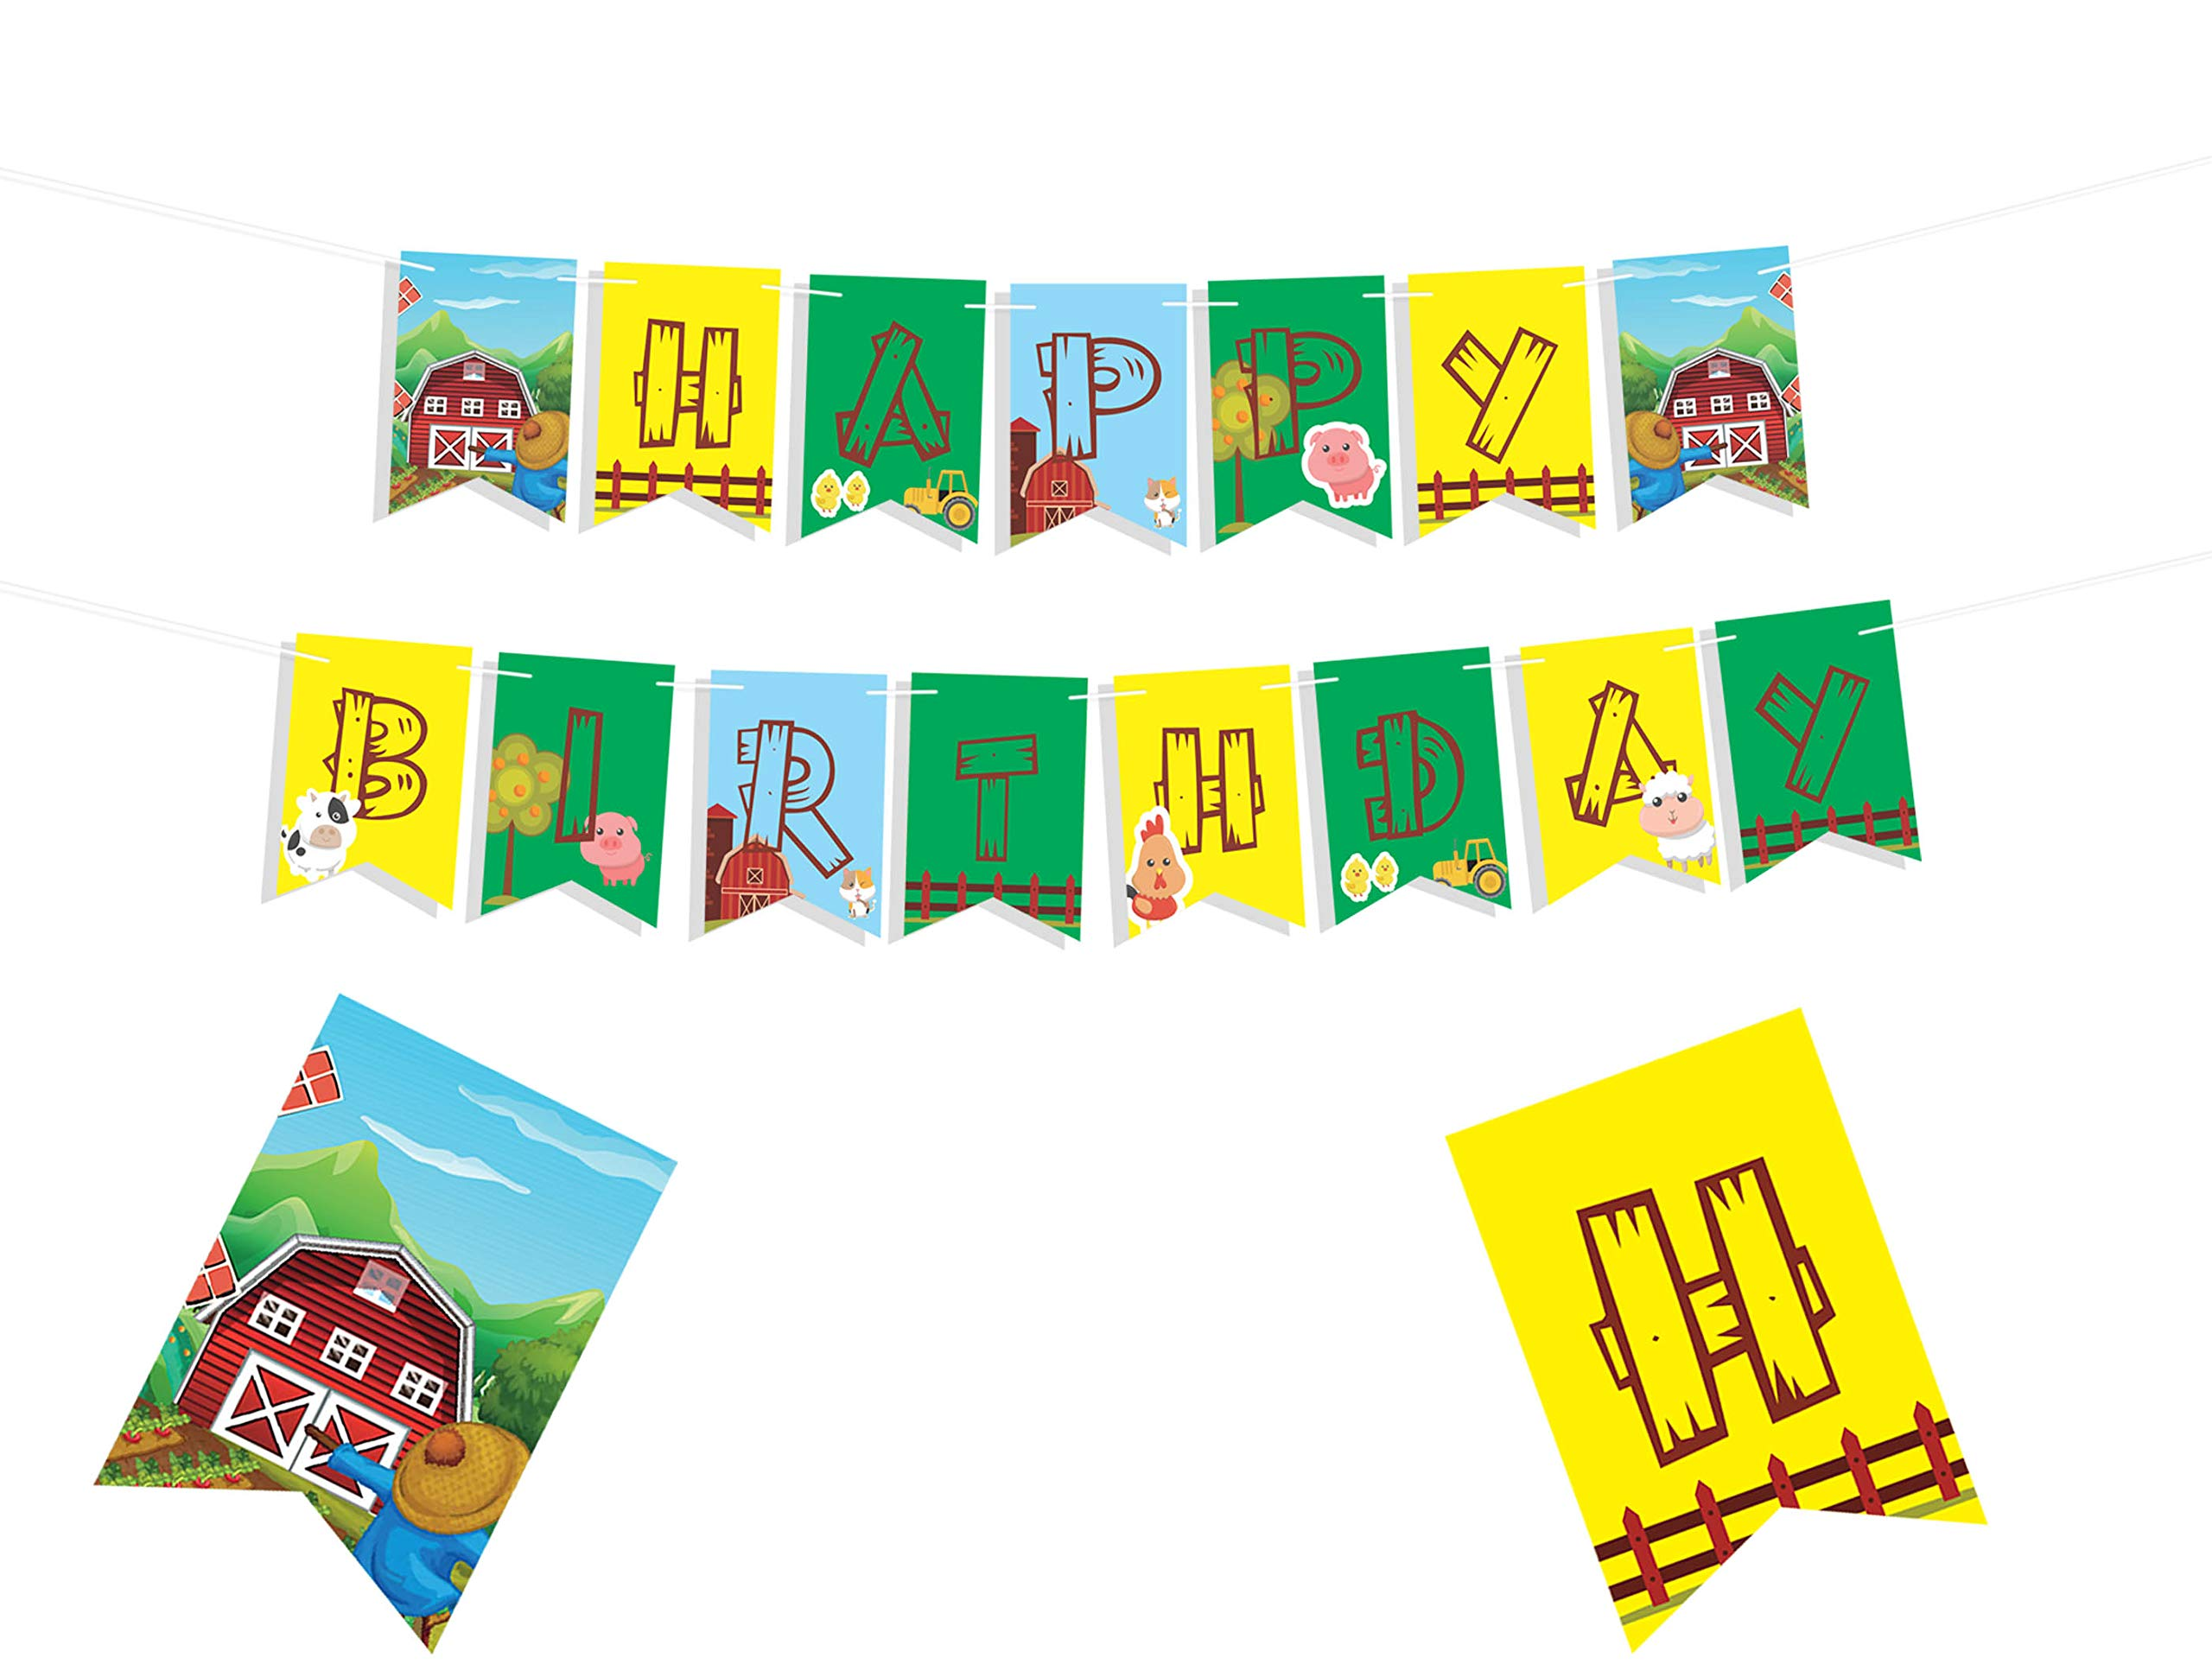 FARM THEMED HAPPY BIRTHDAY BANNER - Farmhouse Fun Party Supplies Decorations - Animal Farm Party Supplies - Barn Birthday Decor - Old Macdonald Party Supplies - Barnyard Party Supplies - Farm Games Birthday Decor - Kid Party Decorations - 8*5.5 Inches